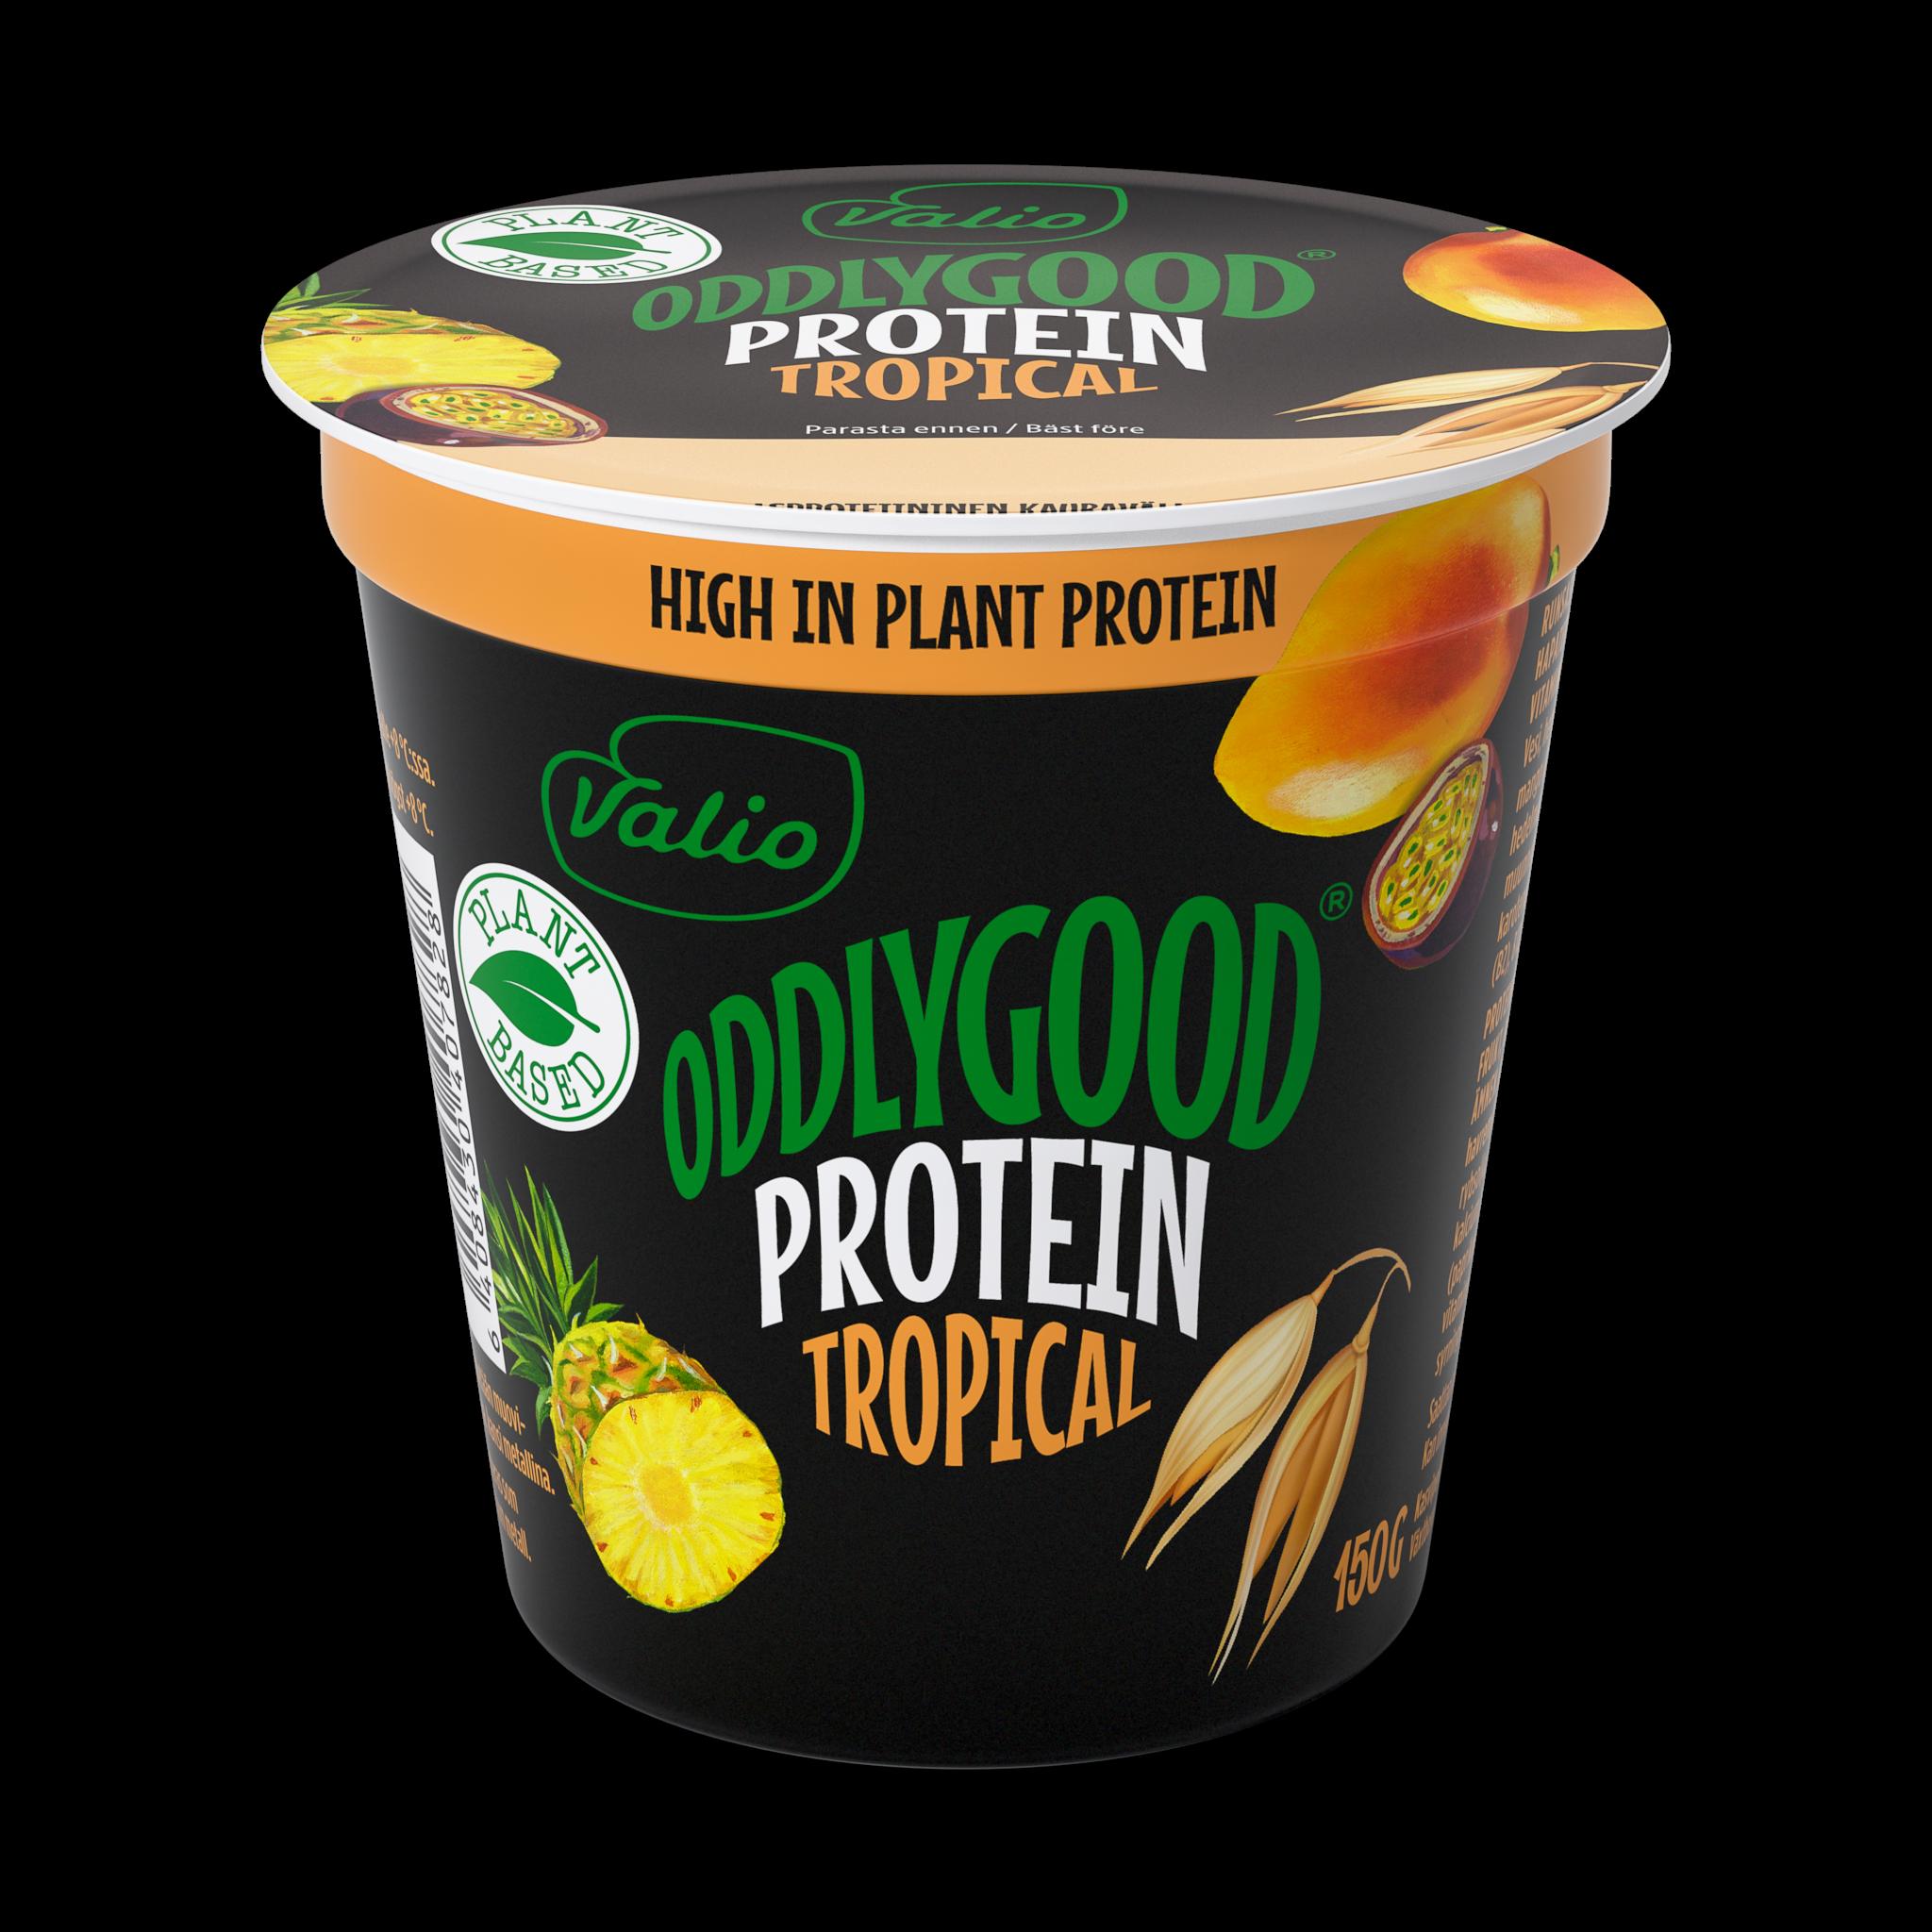 Valio Oddlygood® proteiinivälipala Tropical